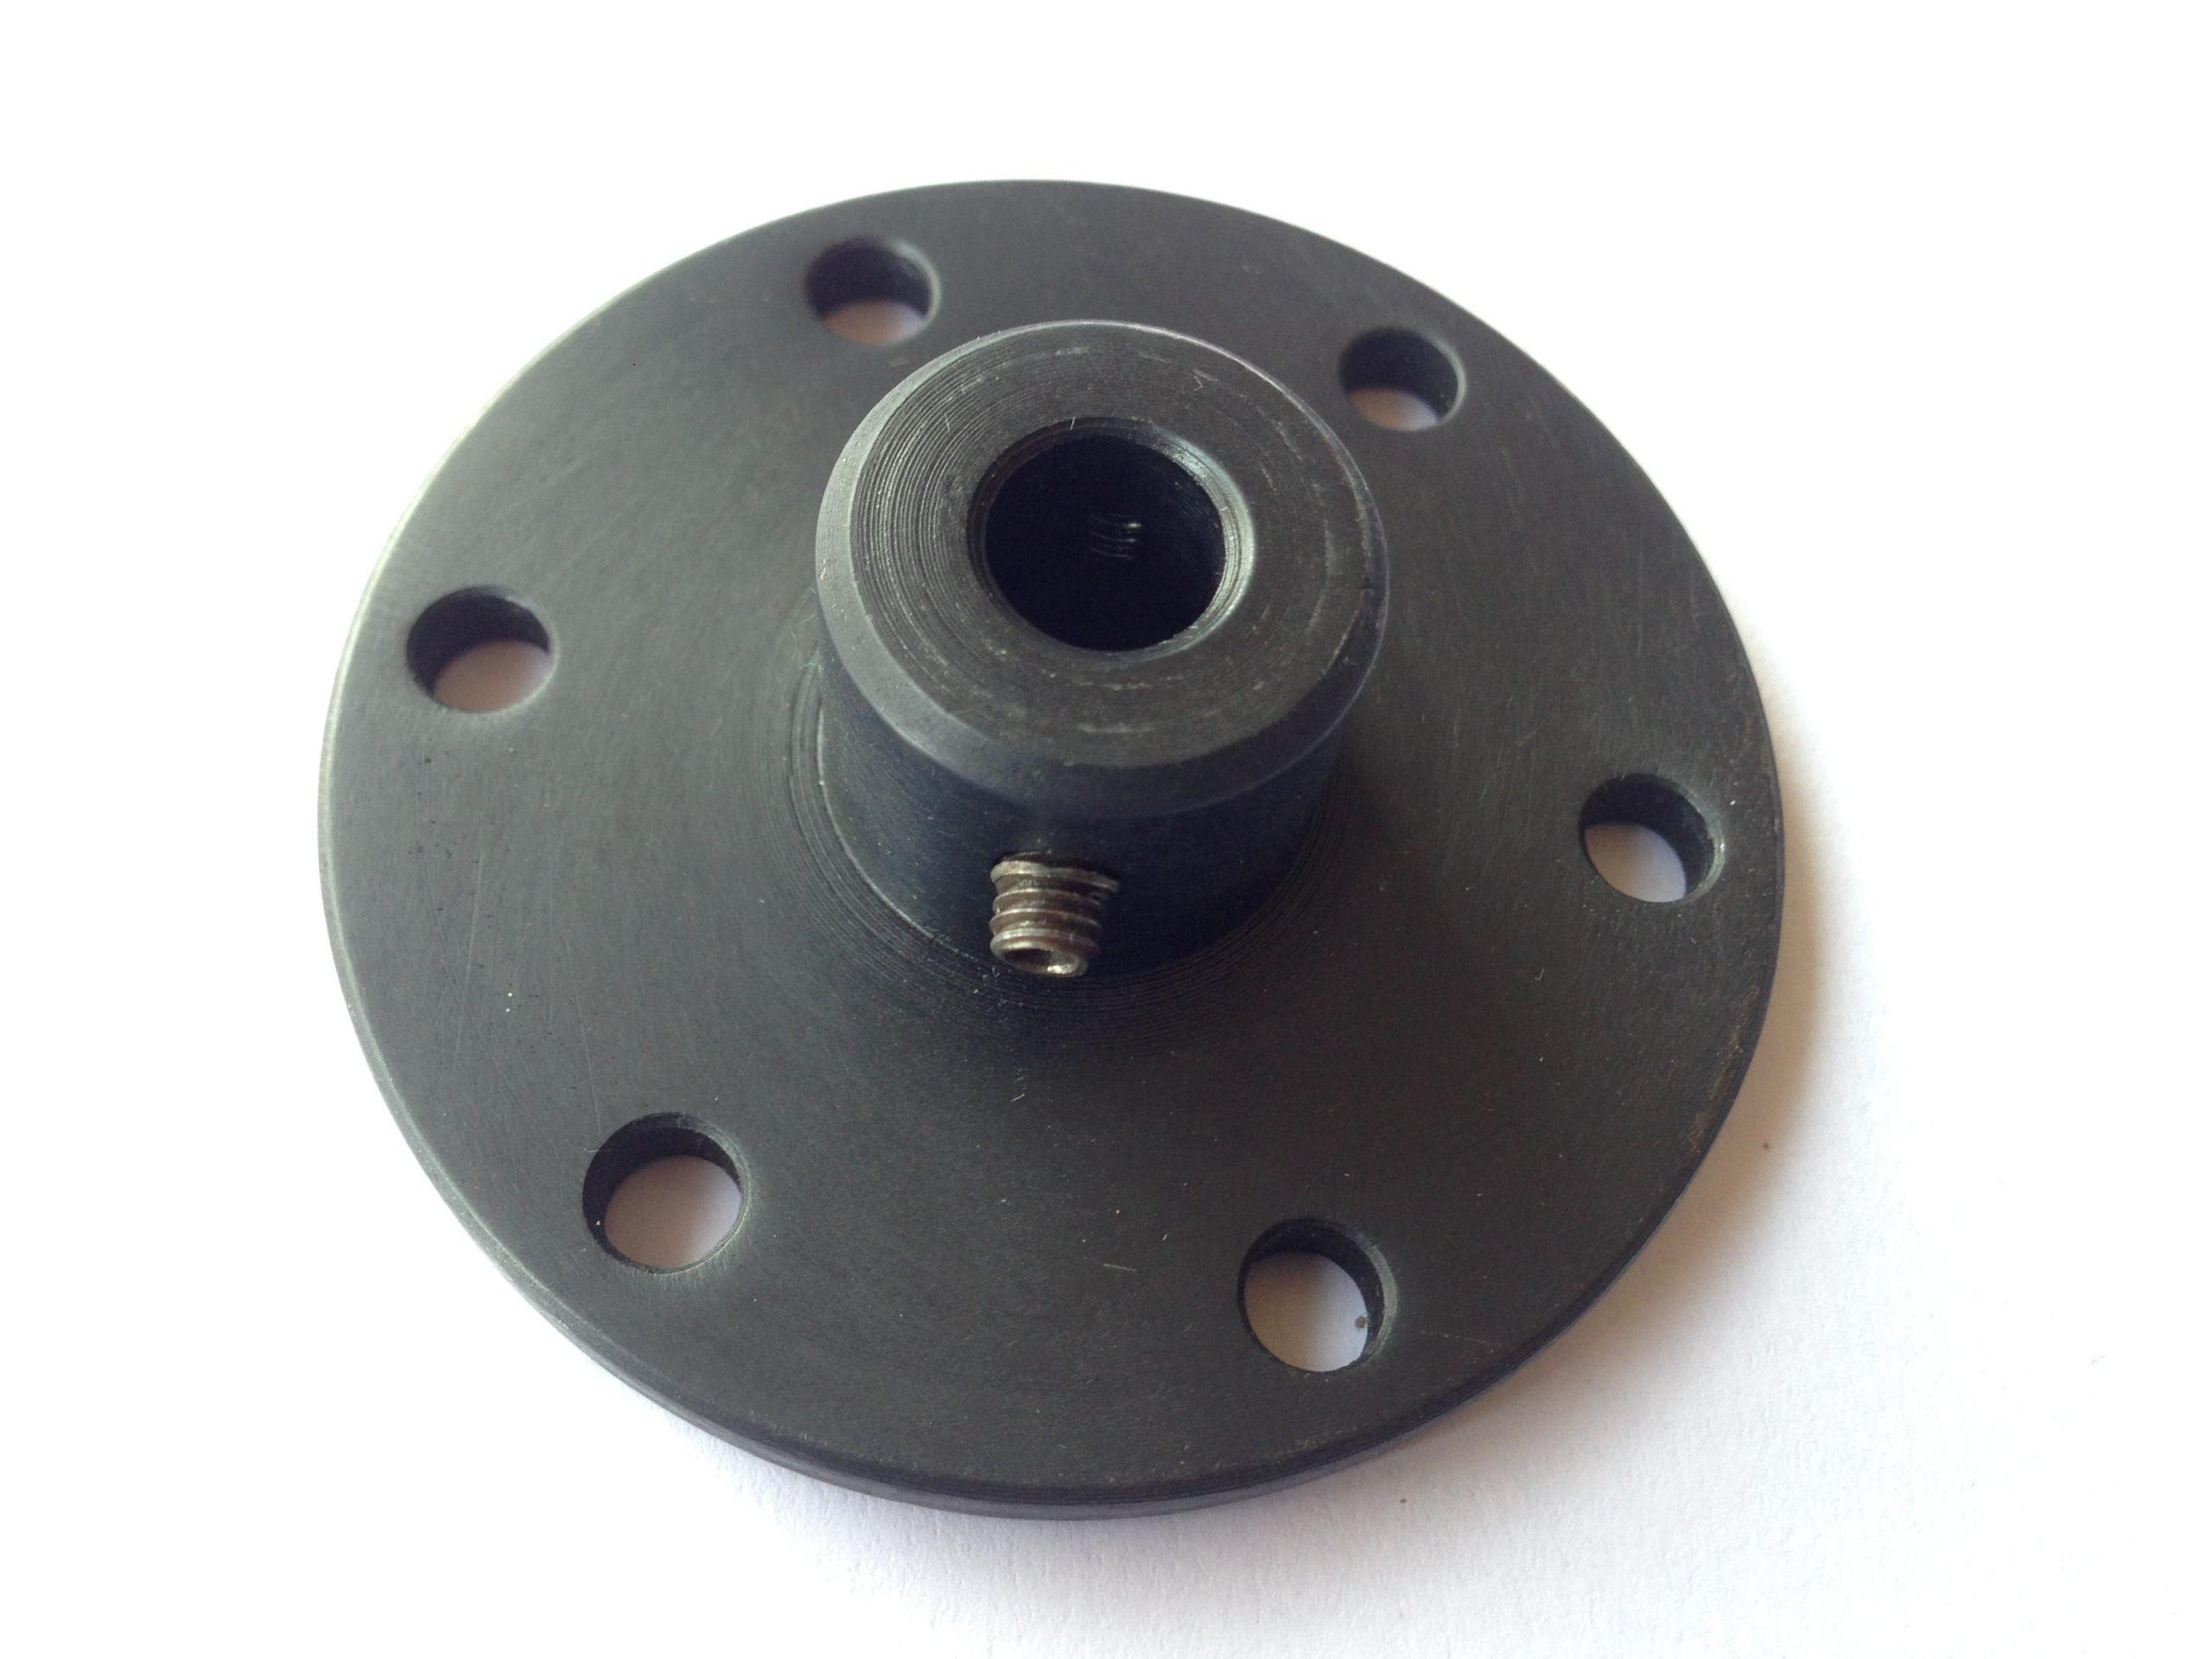 EasyMech ID-8mm Motor Coupling Hub (Big)